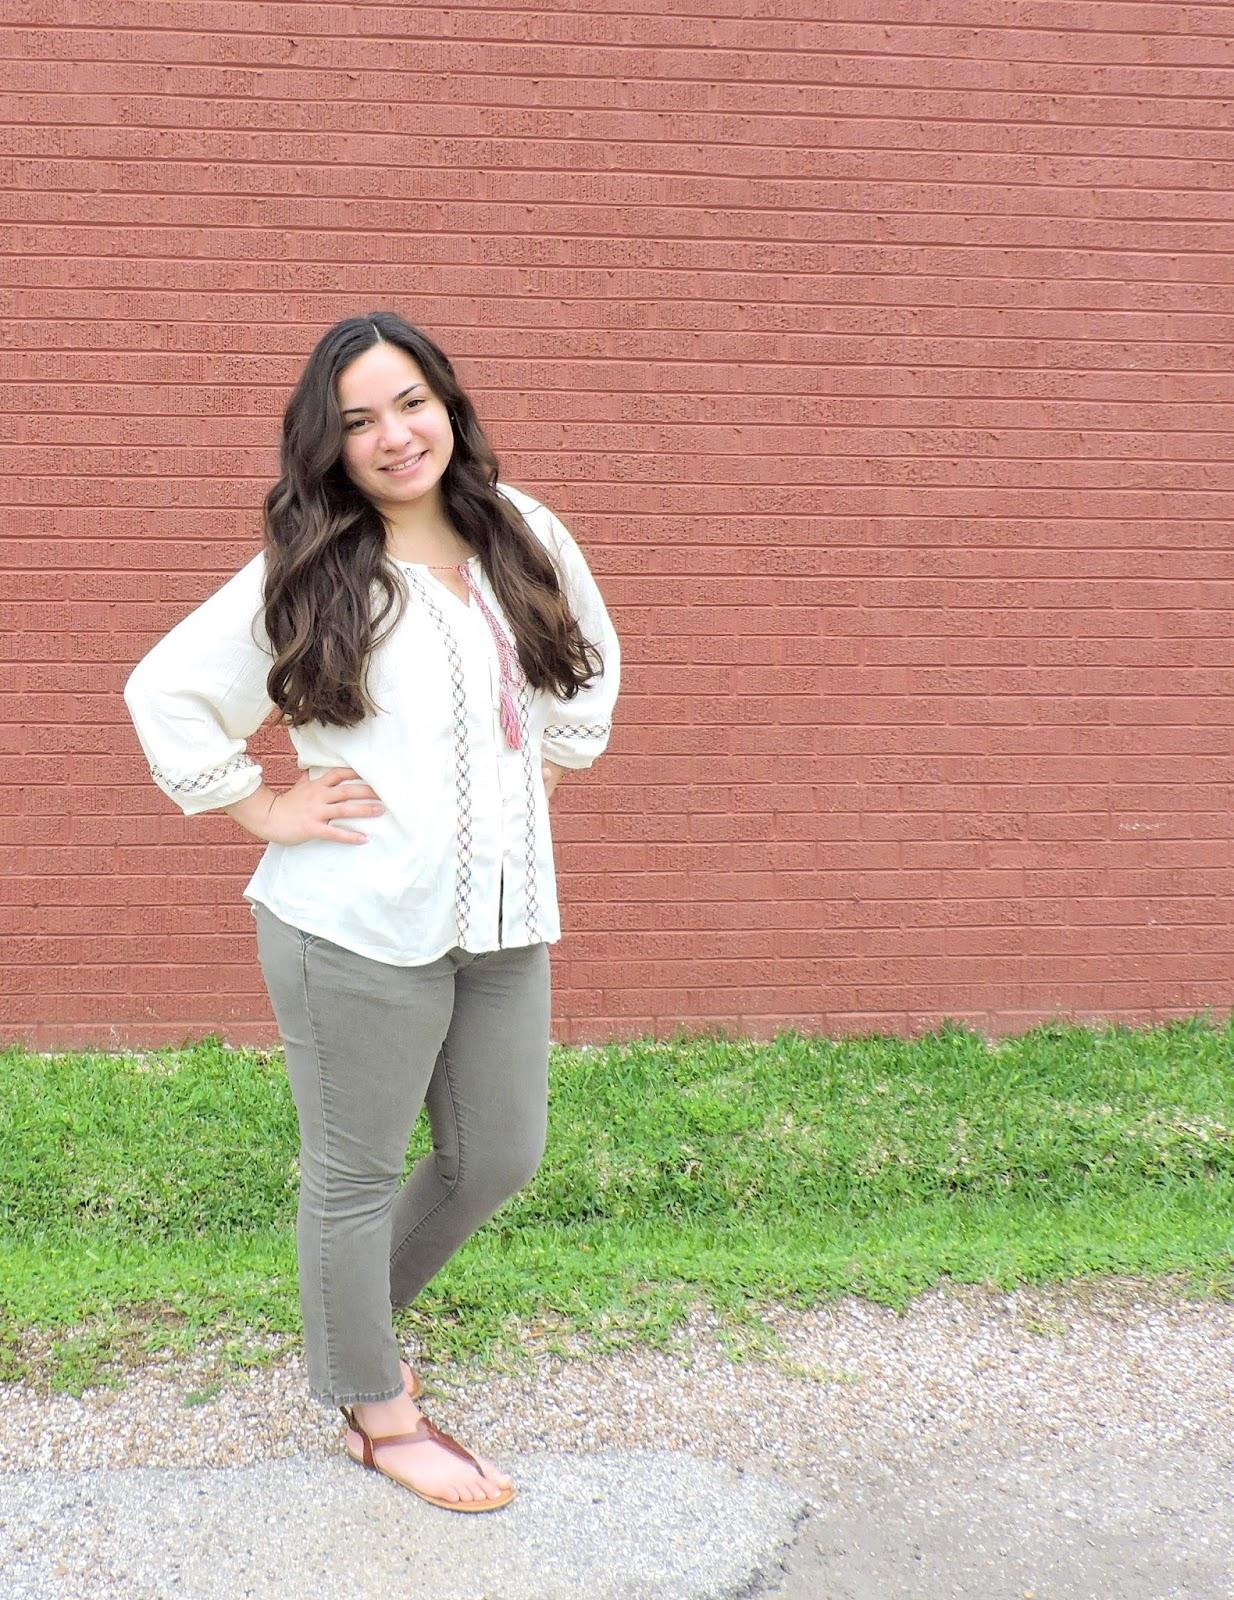 c16de3bd46658 stormieariel  Cinco de Mayo Outfit Inspiration + GIVEAWAY